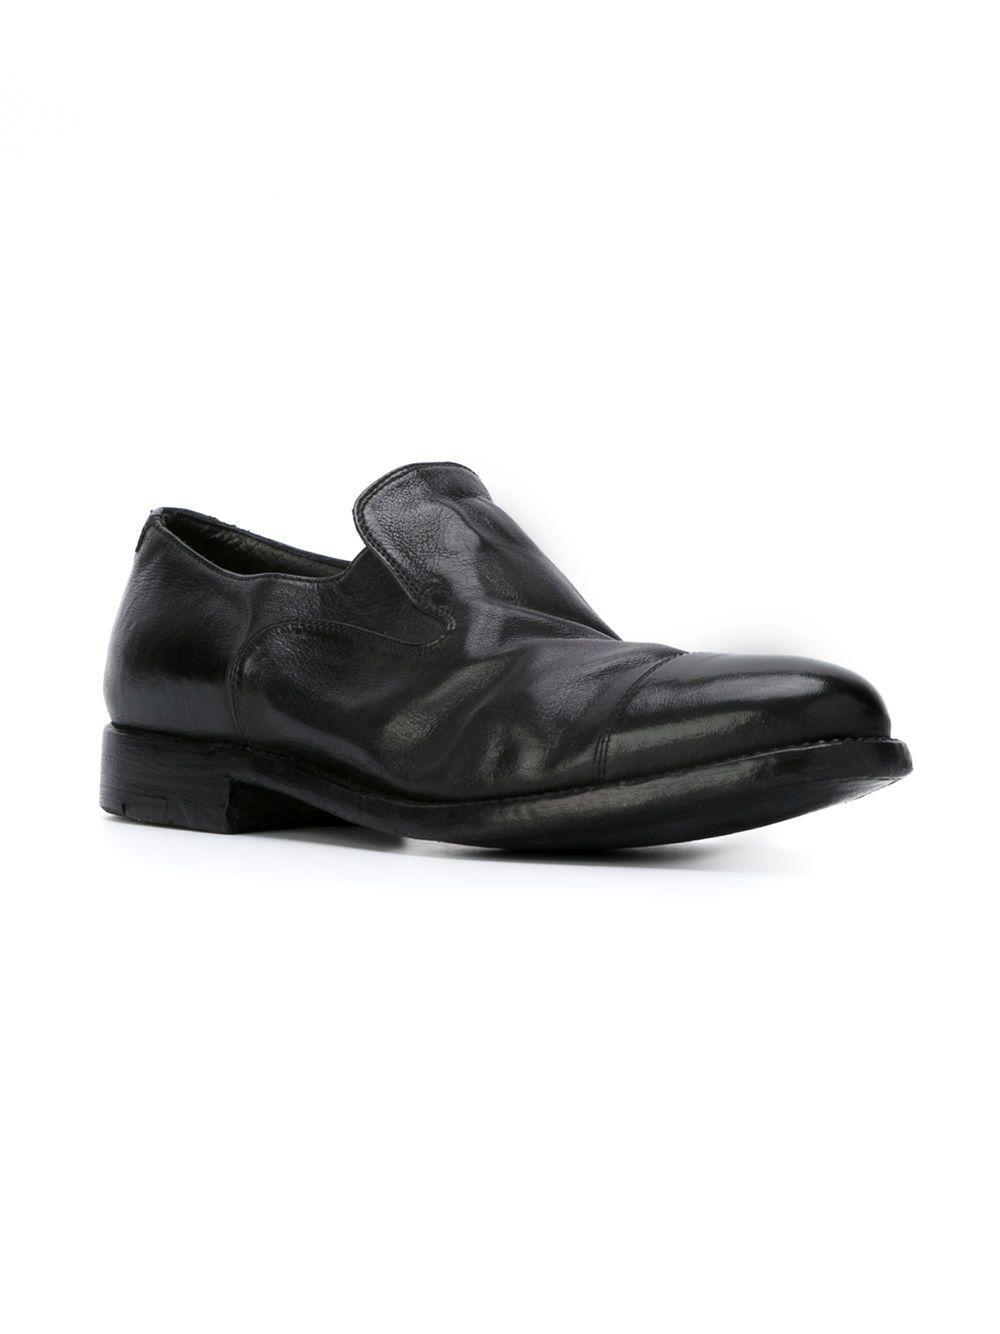 Alberto Fasciani Leather 'queen' Slippers in Black for Men